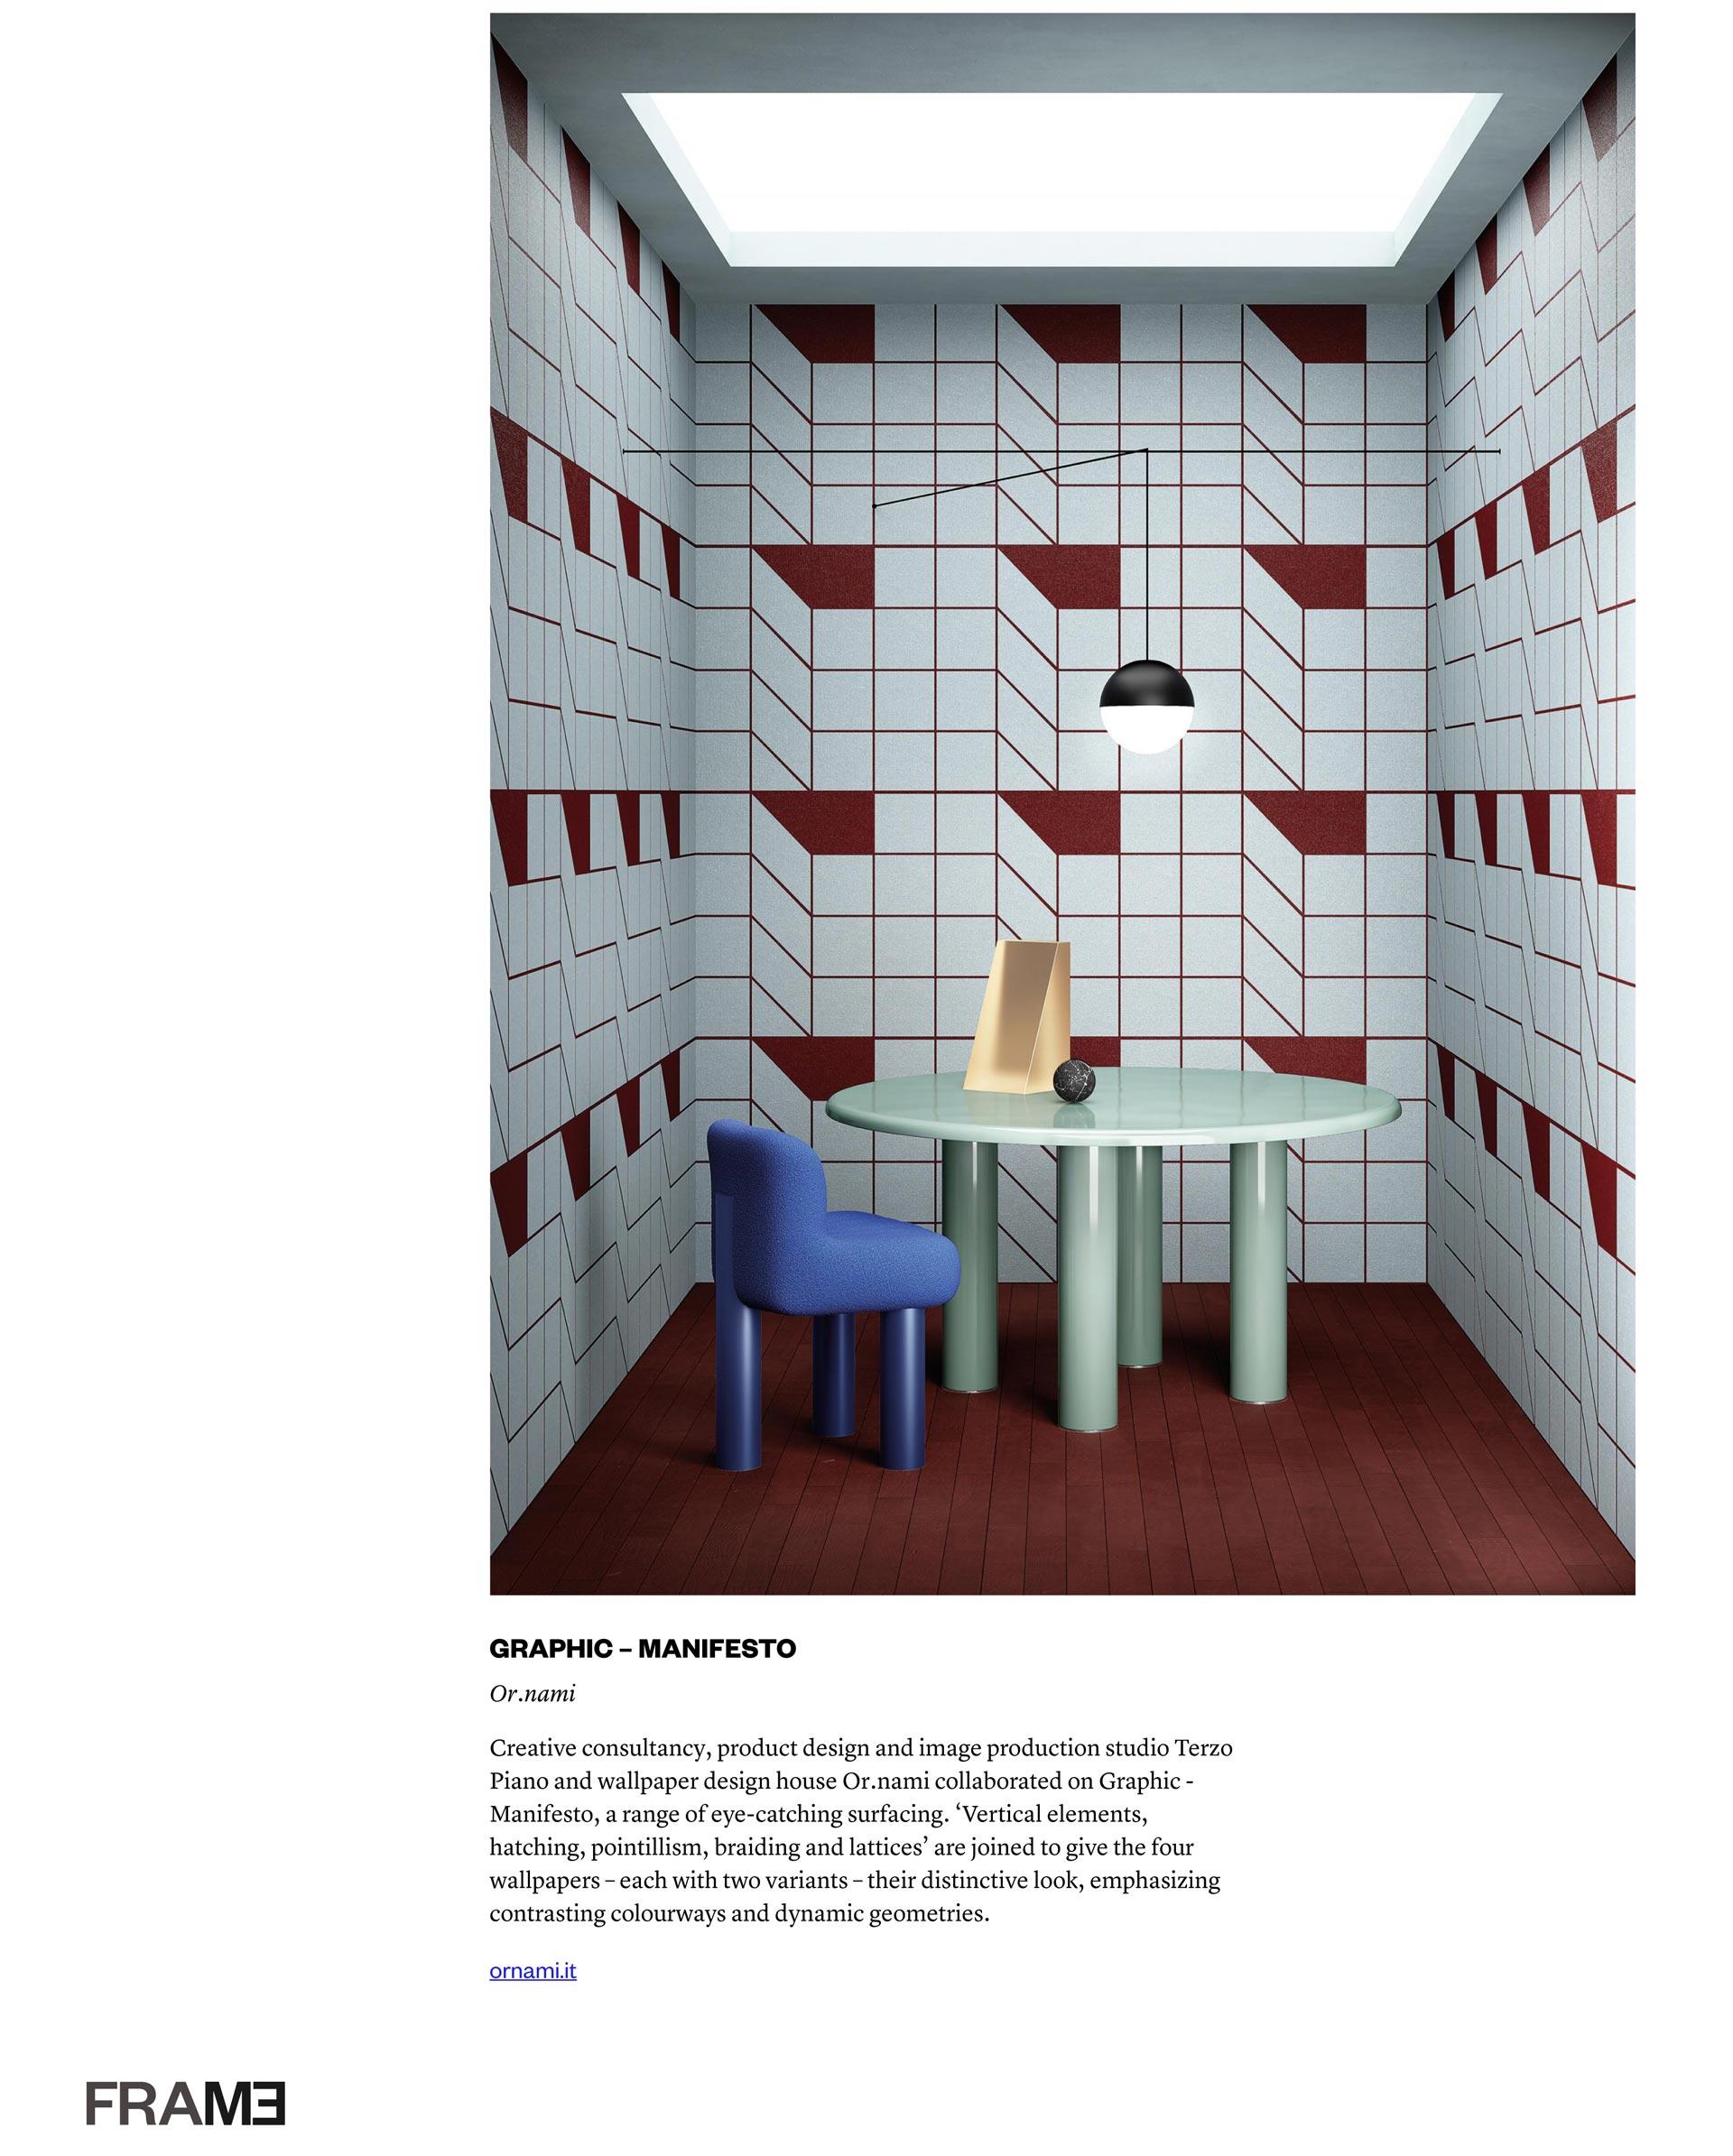 Frame-Graphic-Manifesto-TerzoPiano x Ornami